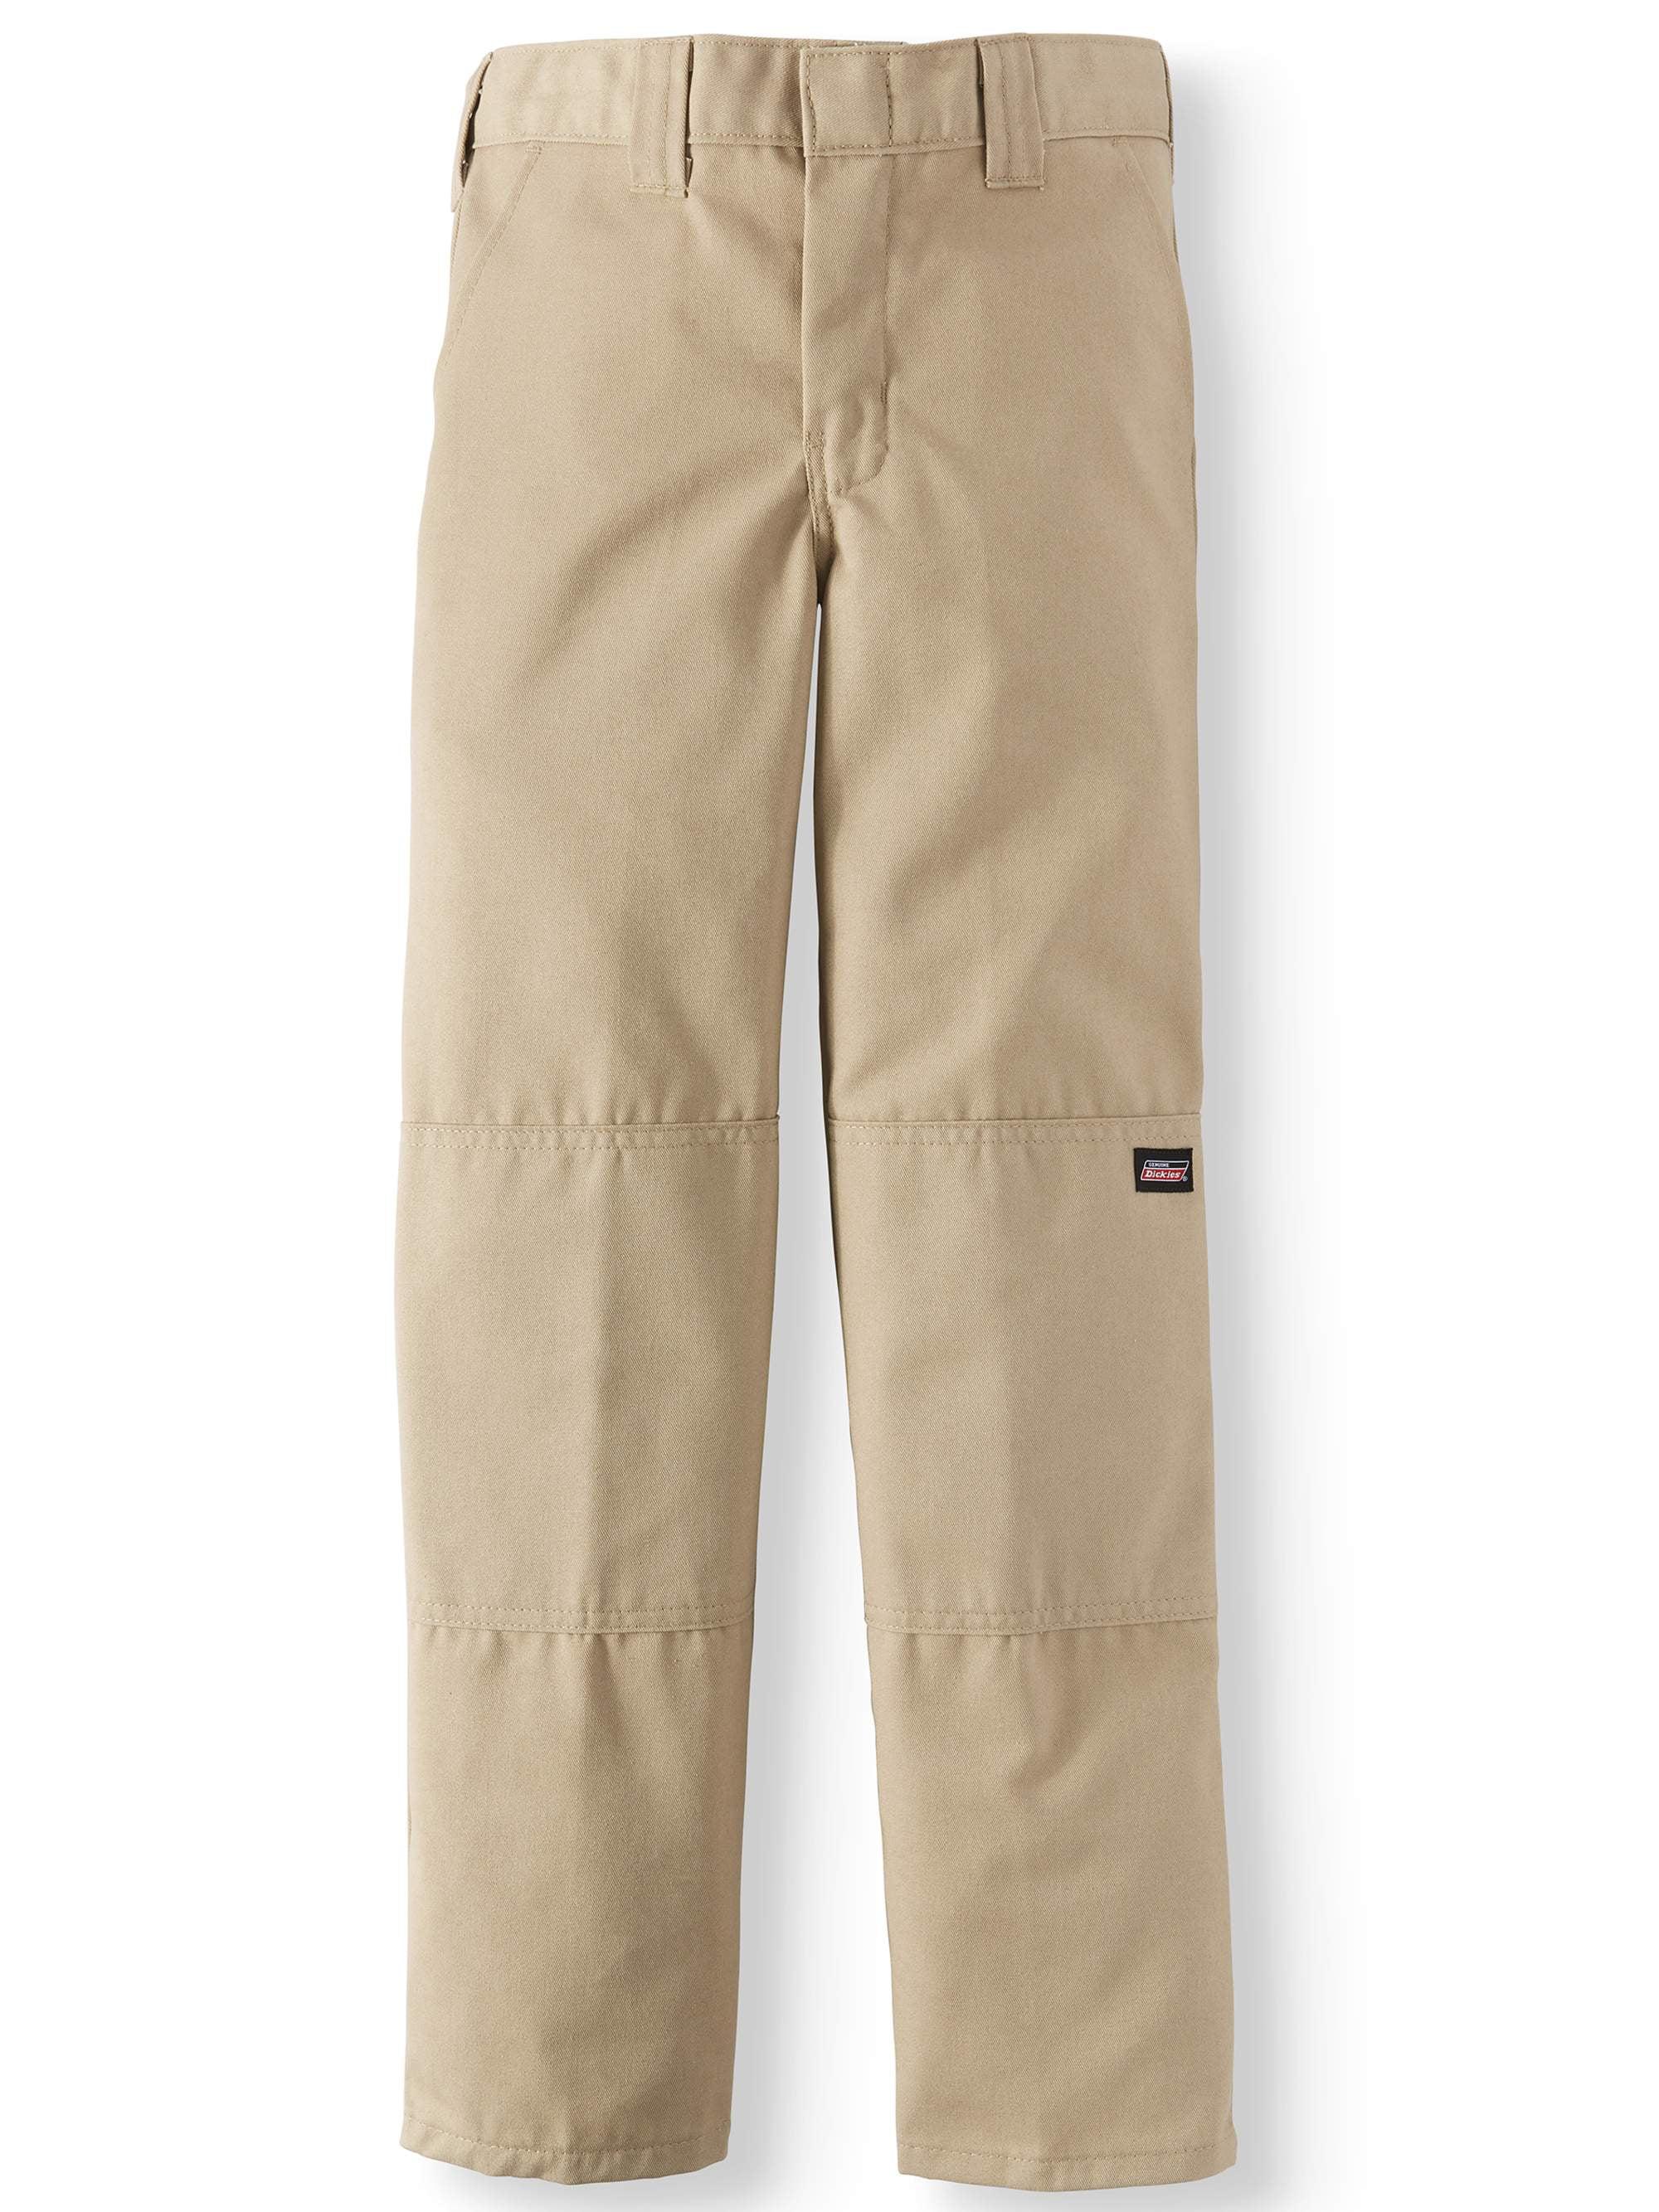 02930fe4a Genuine Dickies - Husky Boy's Traditional School Uniform Style Pants -  Walmart.com